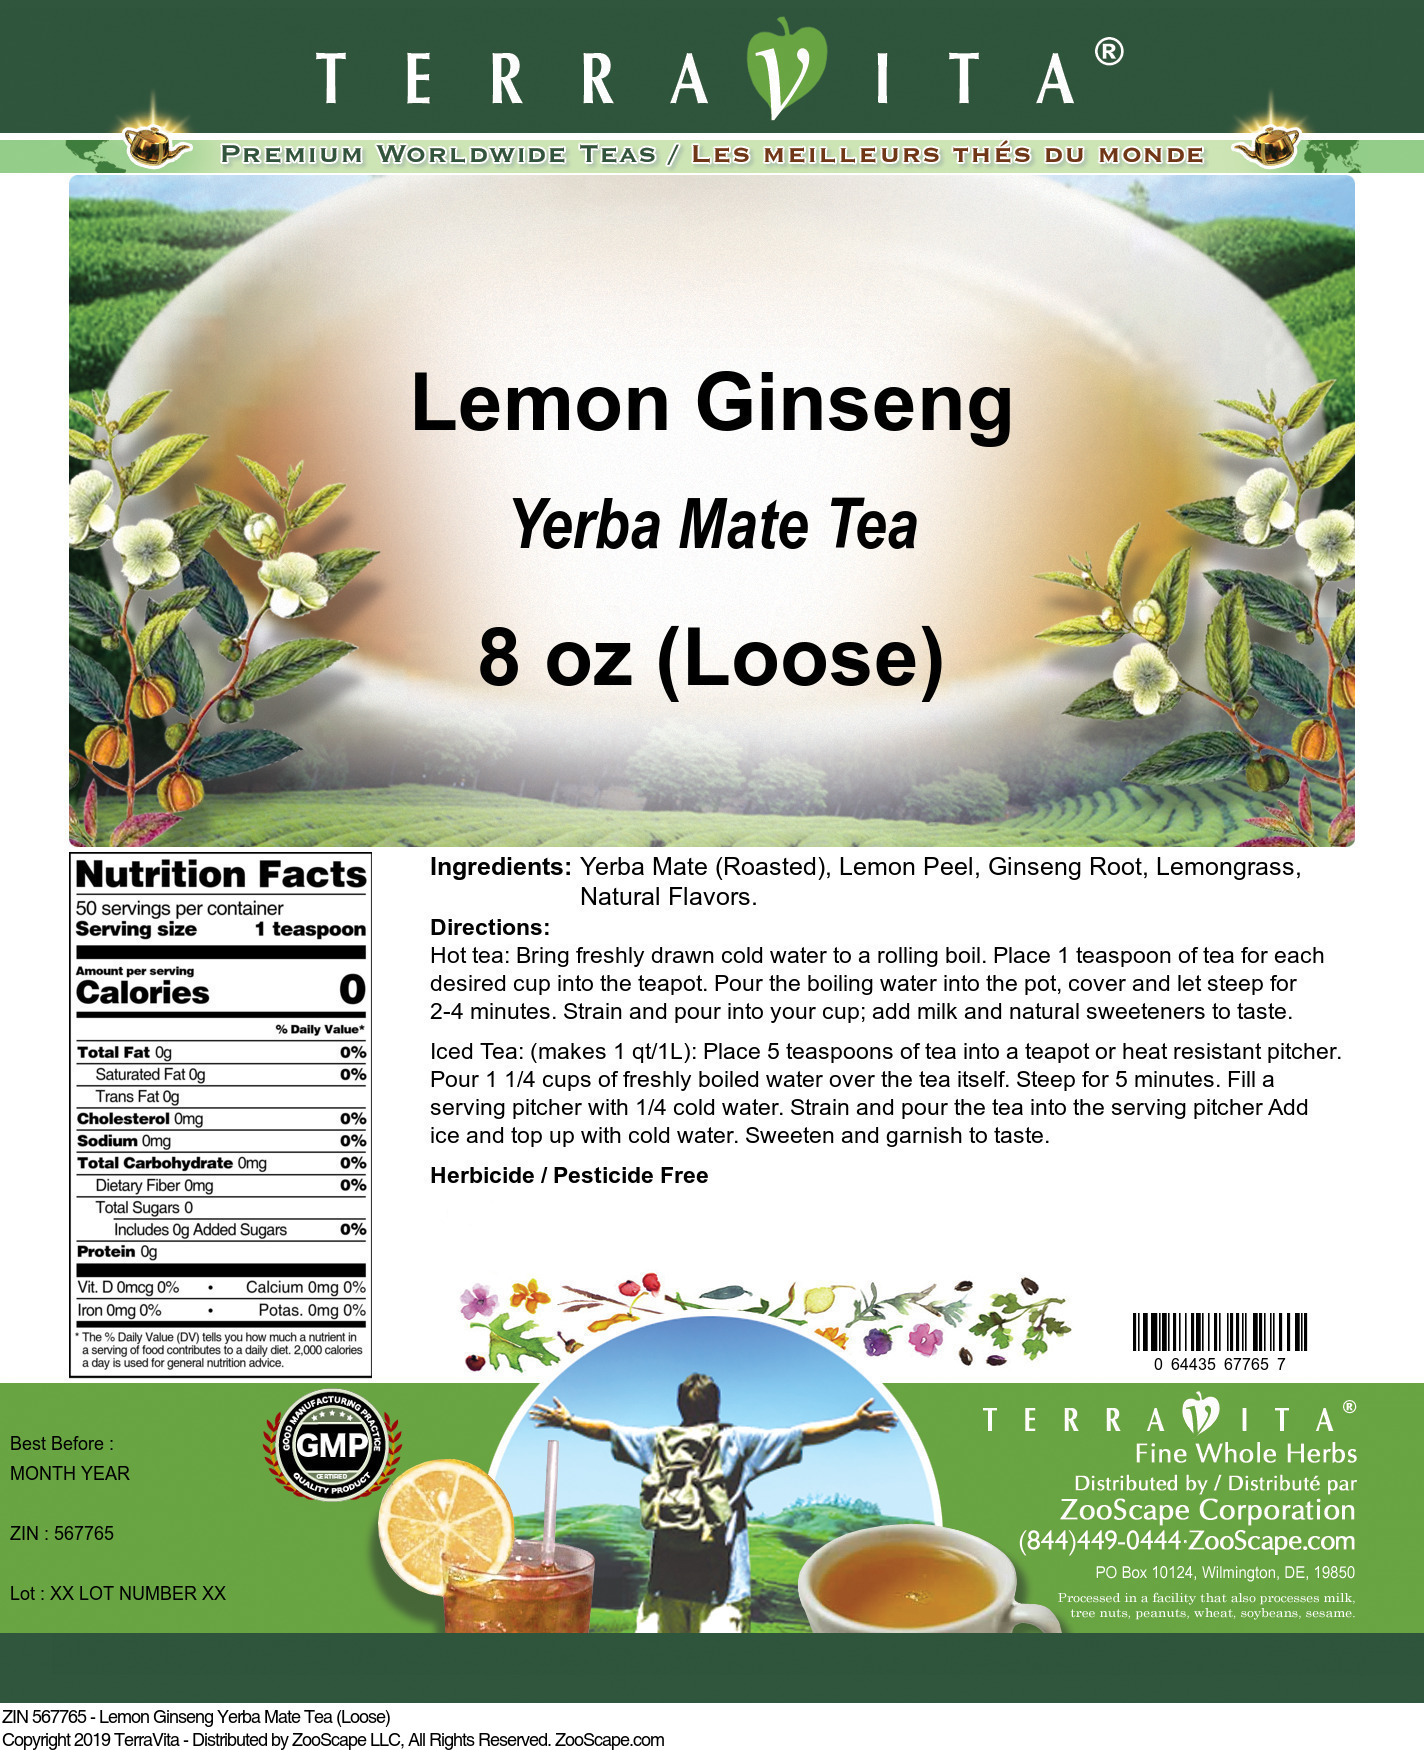 Lemon Ginseng Yerba Mate